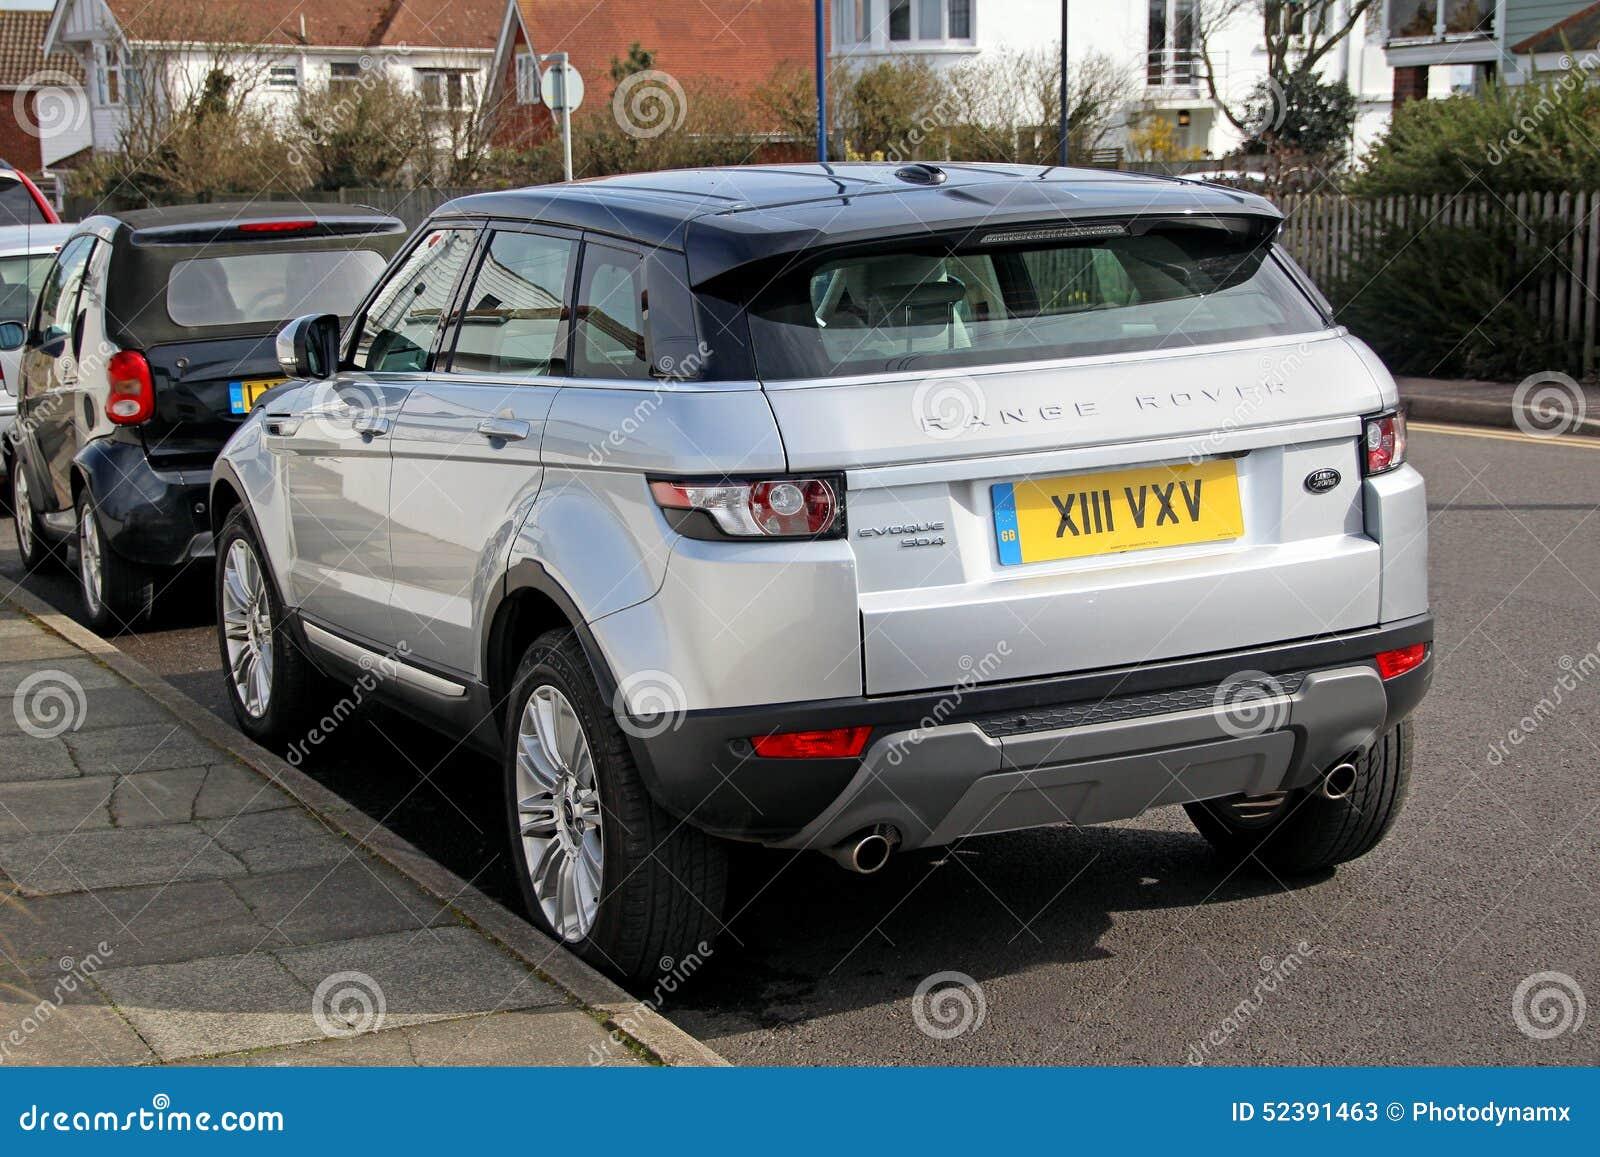 Range Rover Evoque Sports Editorial Stock Photo Image Of Rovers - Range rover stock